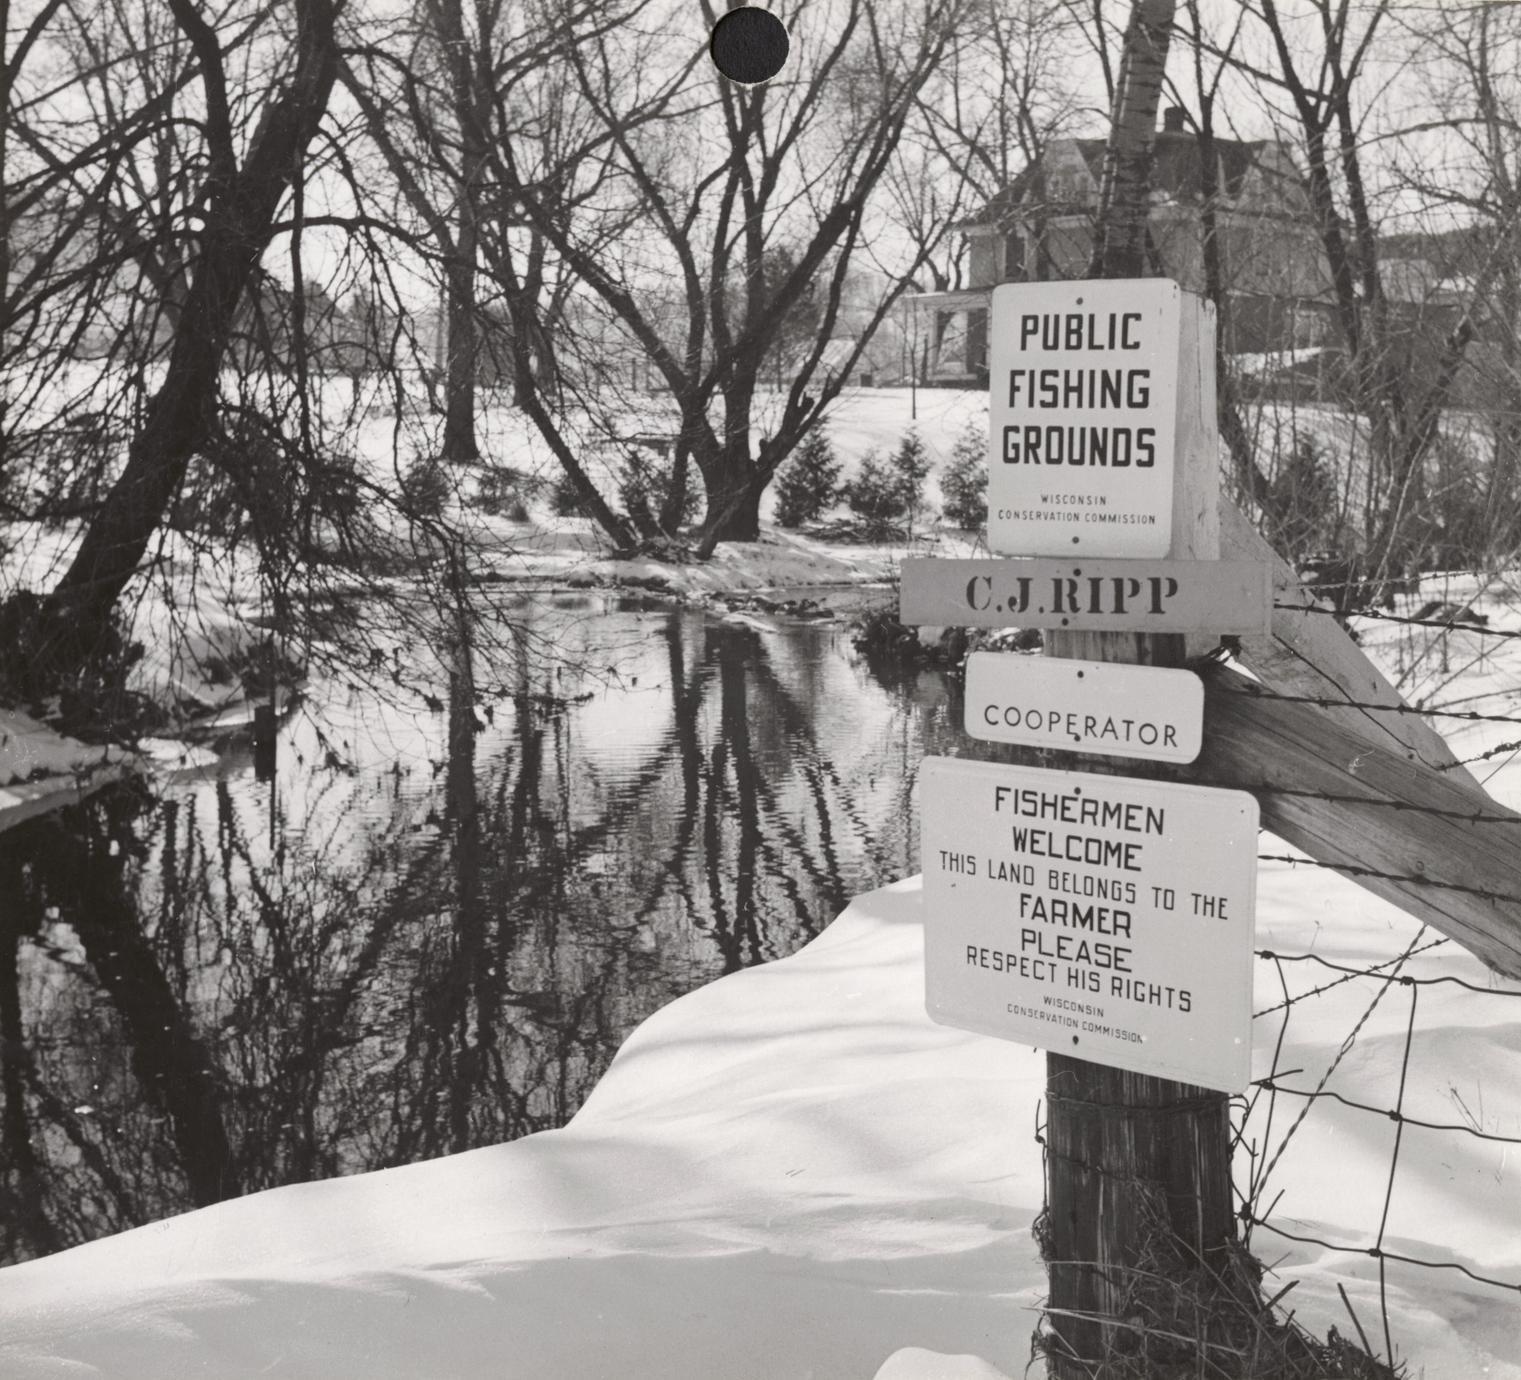 Public access signs